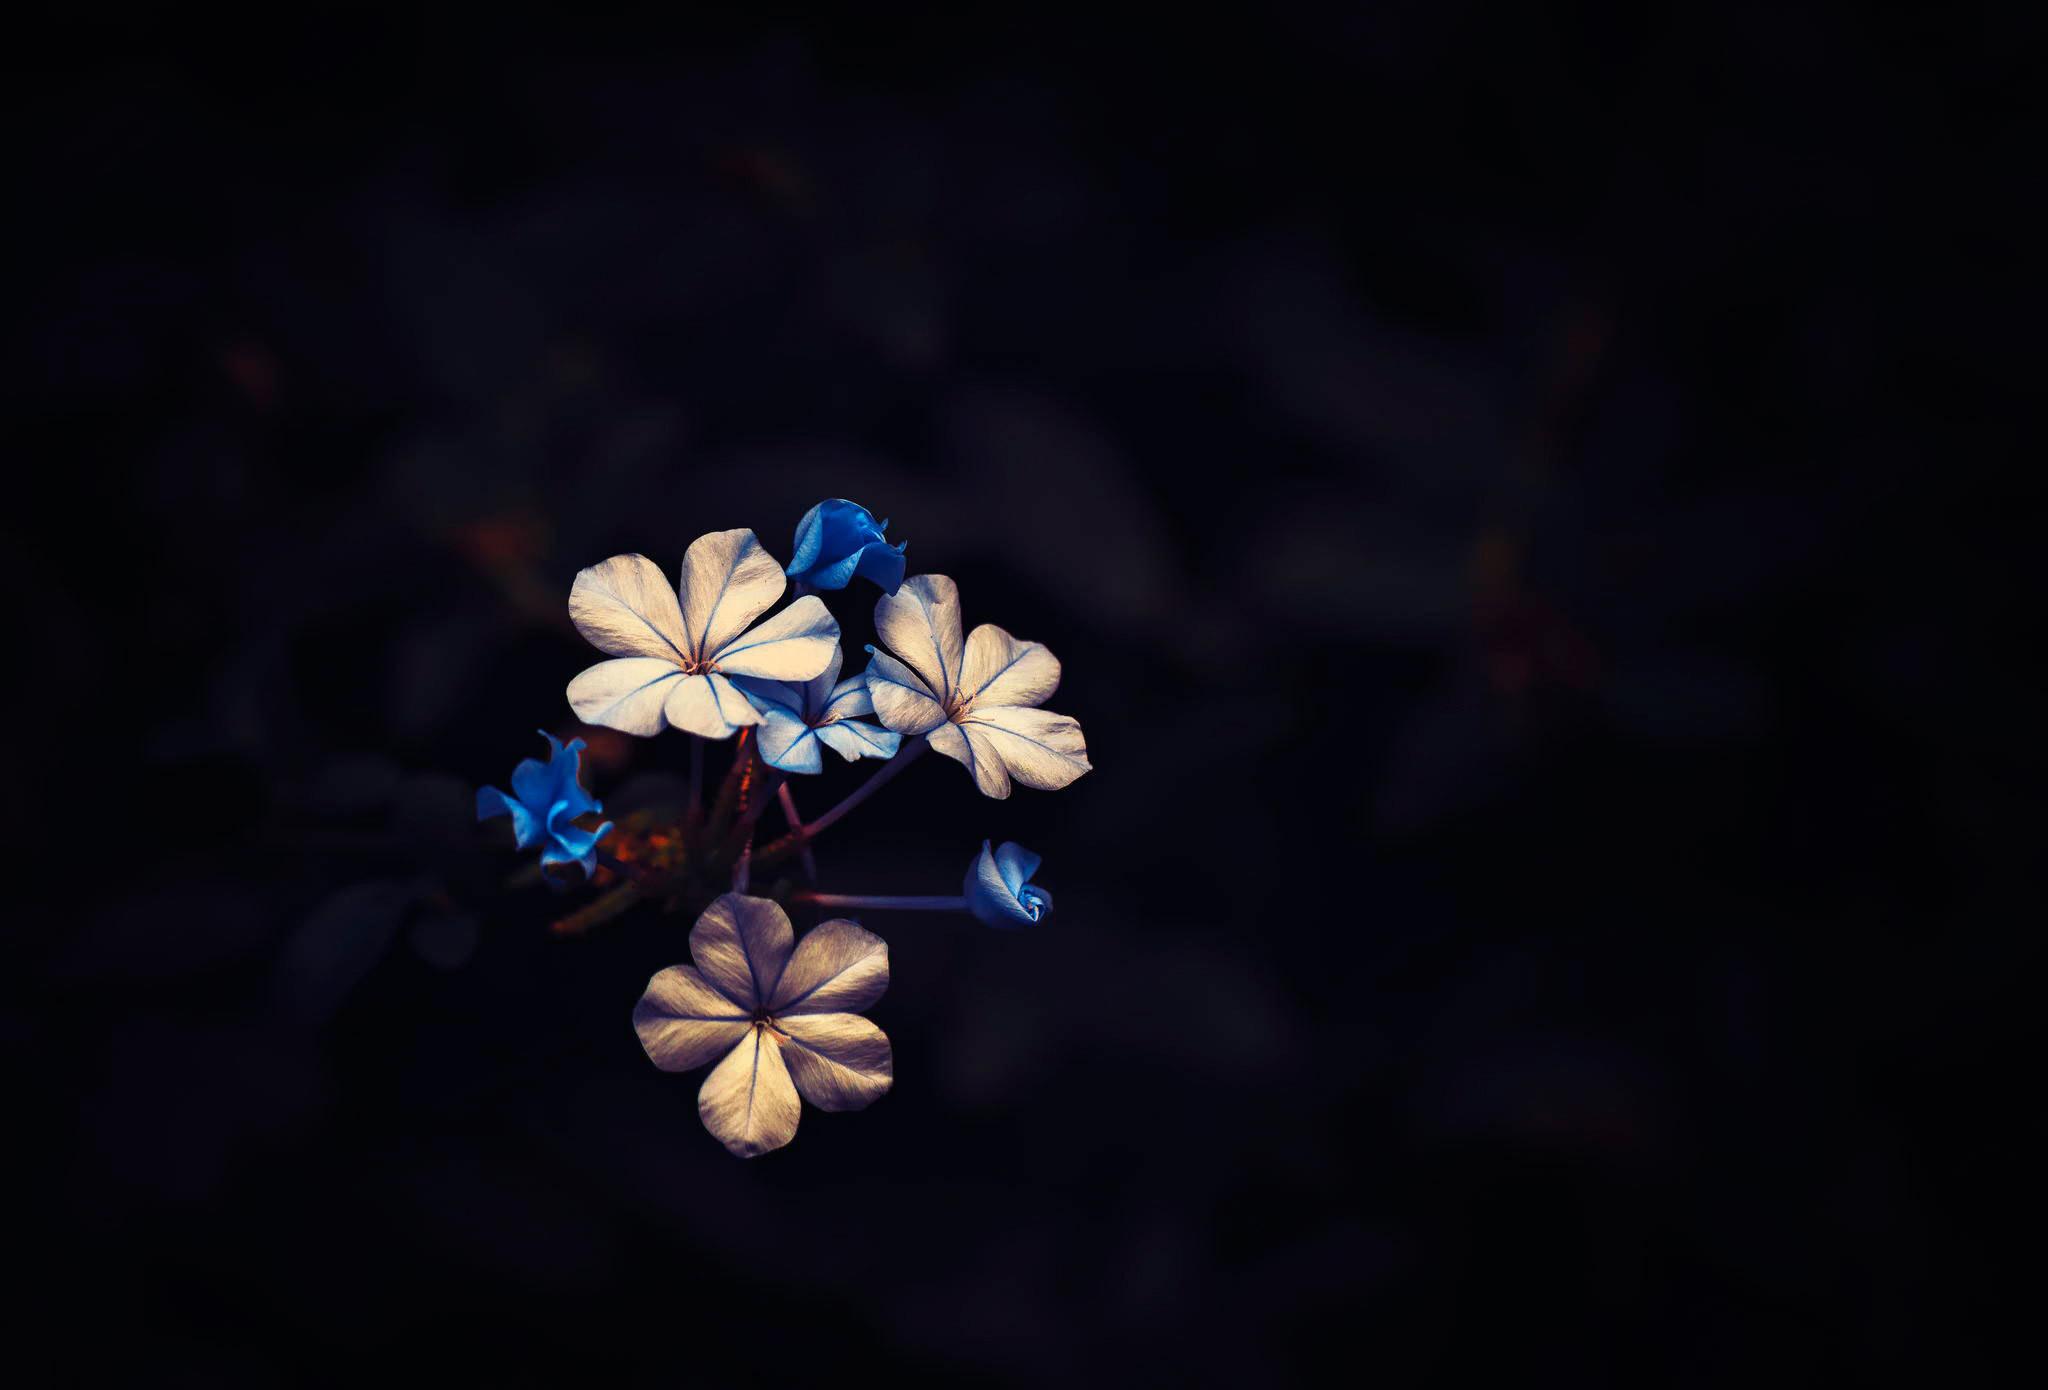 flower, dark, revival, little bloom, black background, hd wallpaper